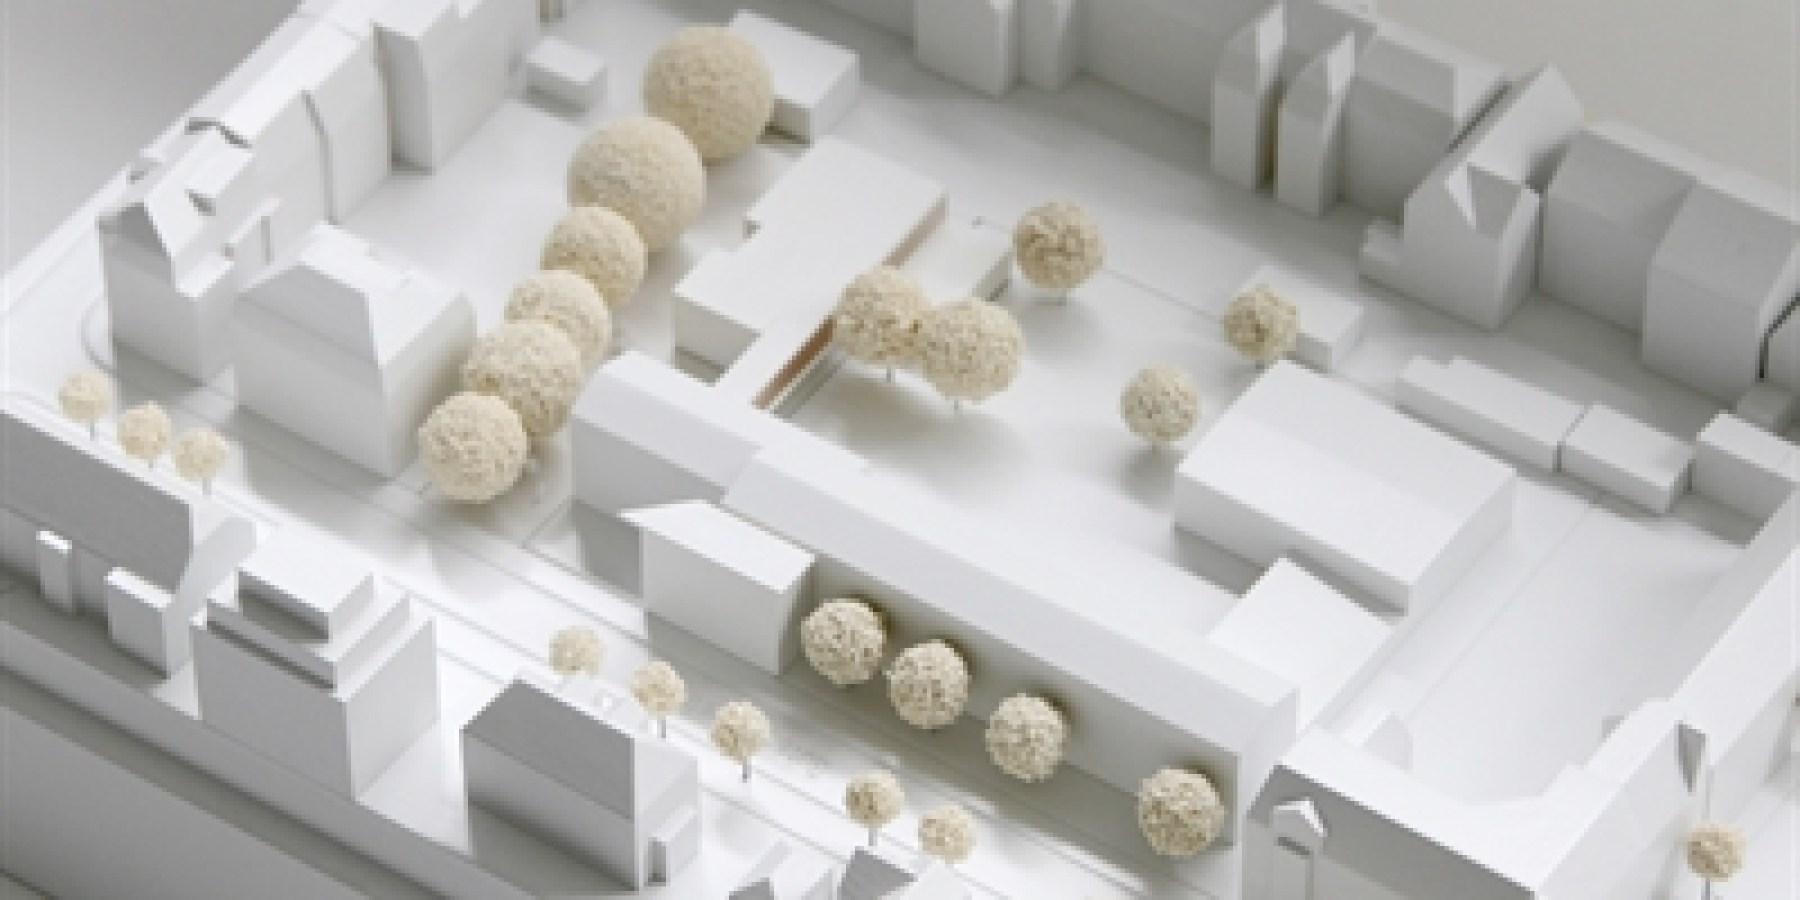 Entwürfe zum Ausbau der Bodelschwinghschule